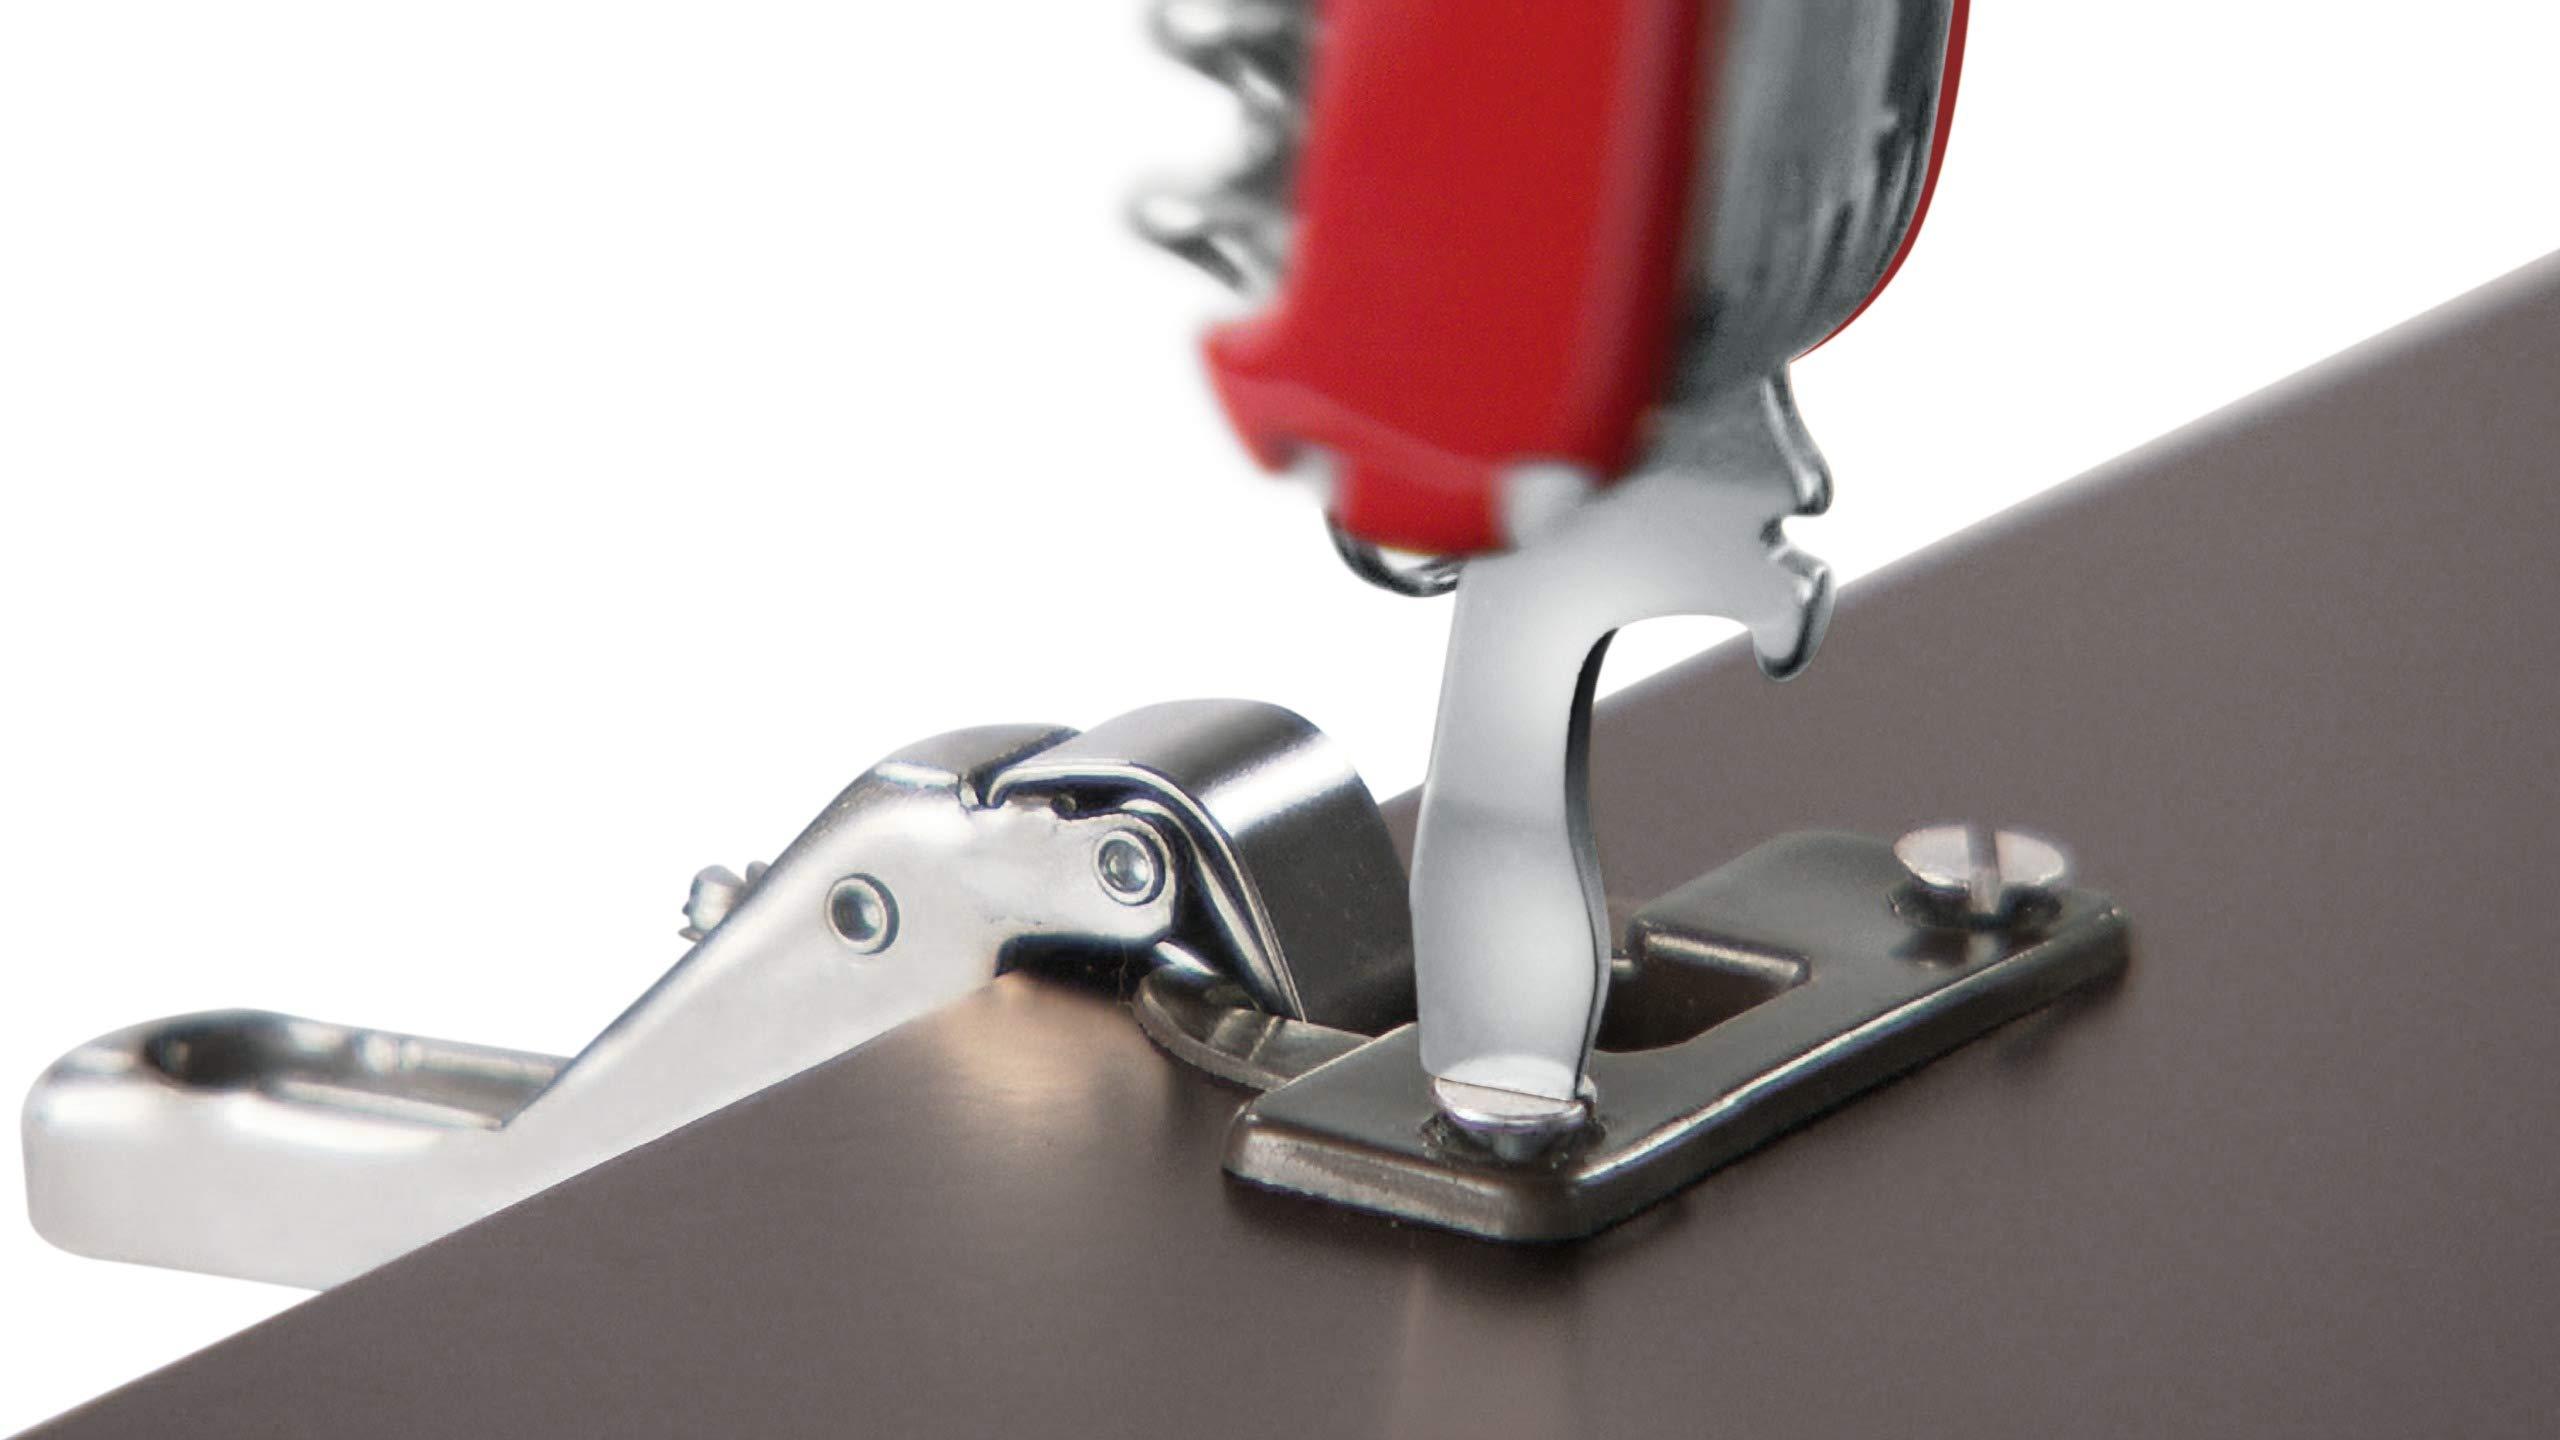 Victorinox Handyman Swiss Army Pocket Knife, Medium, Multi Tool, 24 Functions, Large Blade, Metal Saw, Red 6